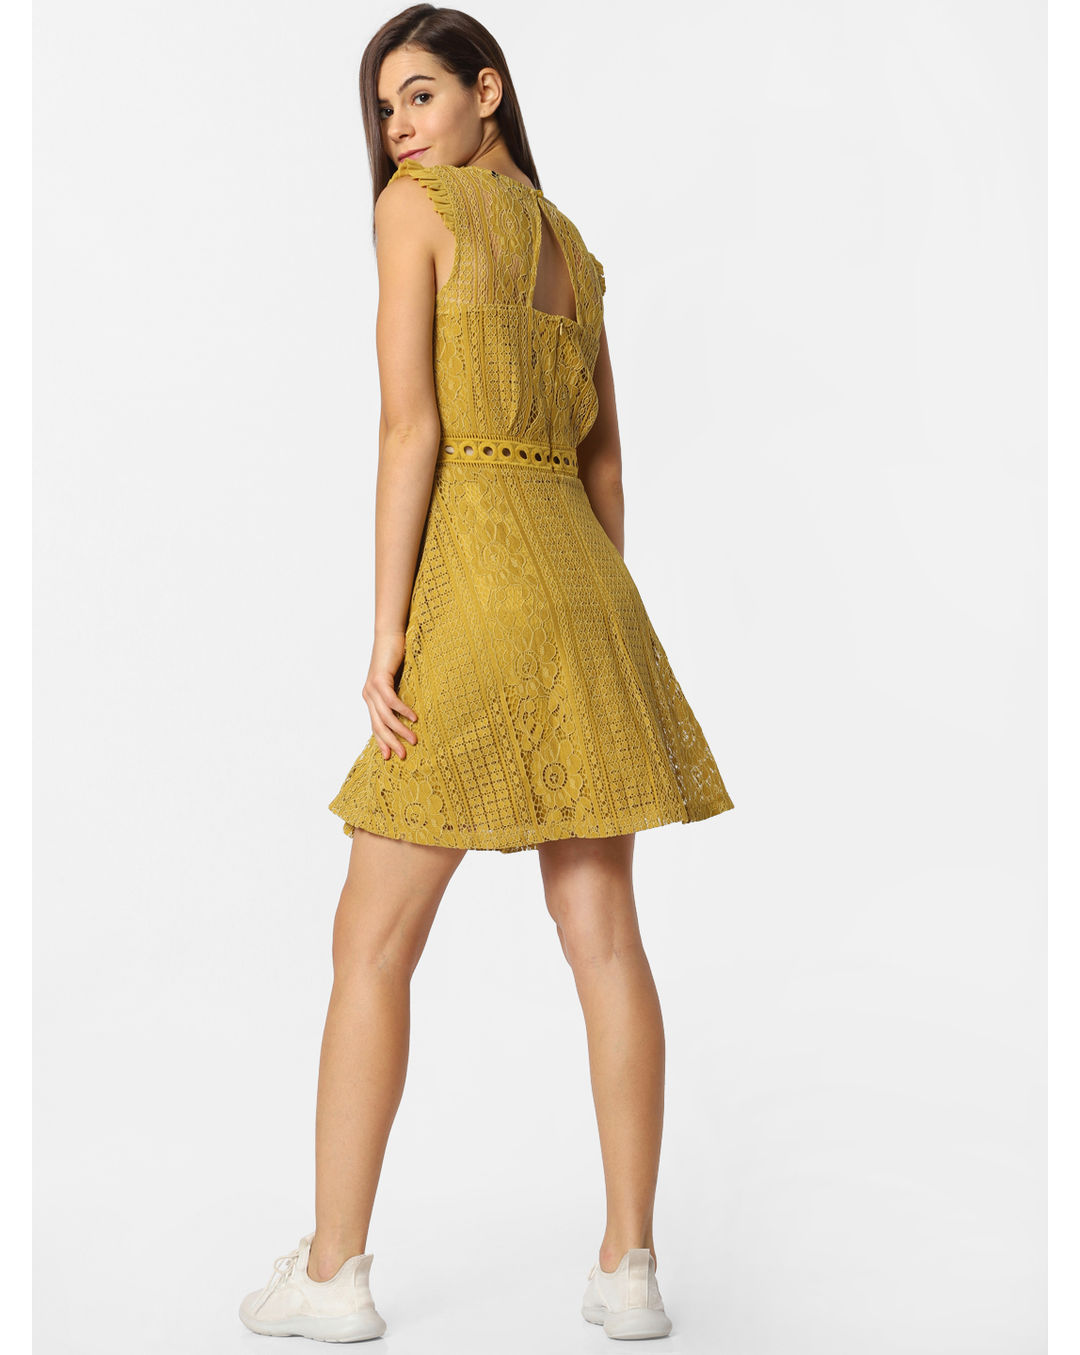 Buy Girls Mustard Lace Skater Dress Online Only